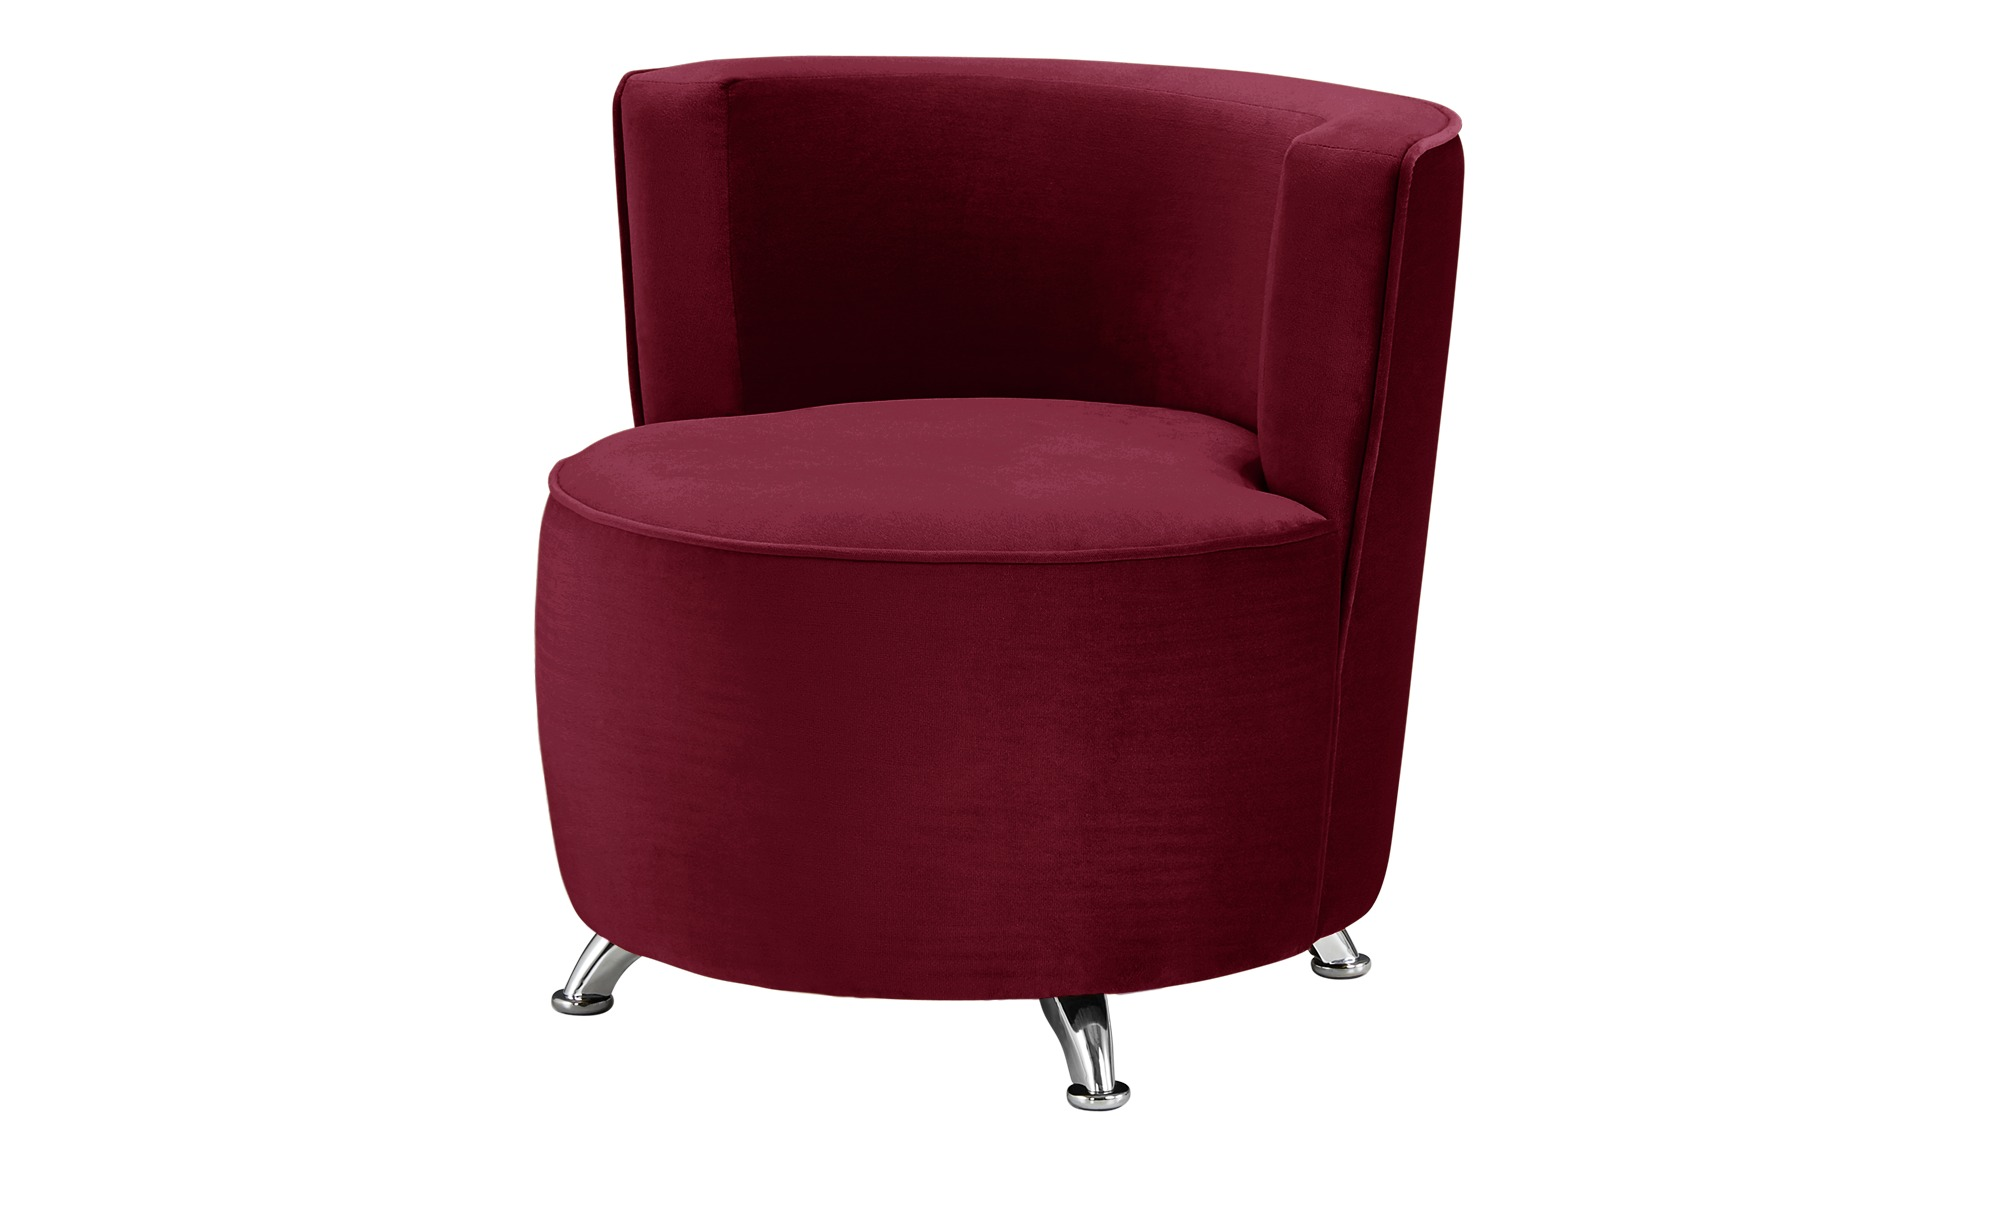 smart Sessel rot - Stoff Baby ¦ rot ¦ Maße (cm): B: 76 H: 71 T: 74 Polstermöbel > Sessel > Polstersessel - Höffner